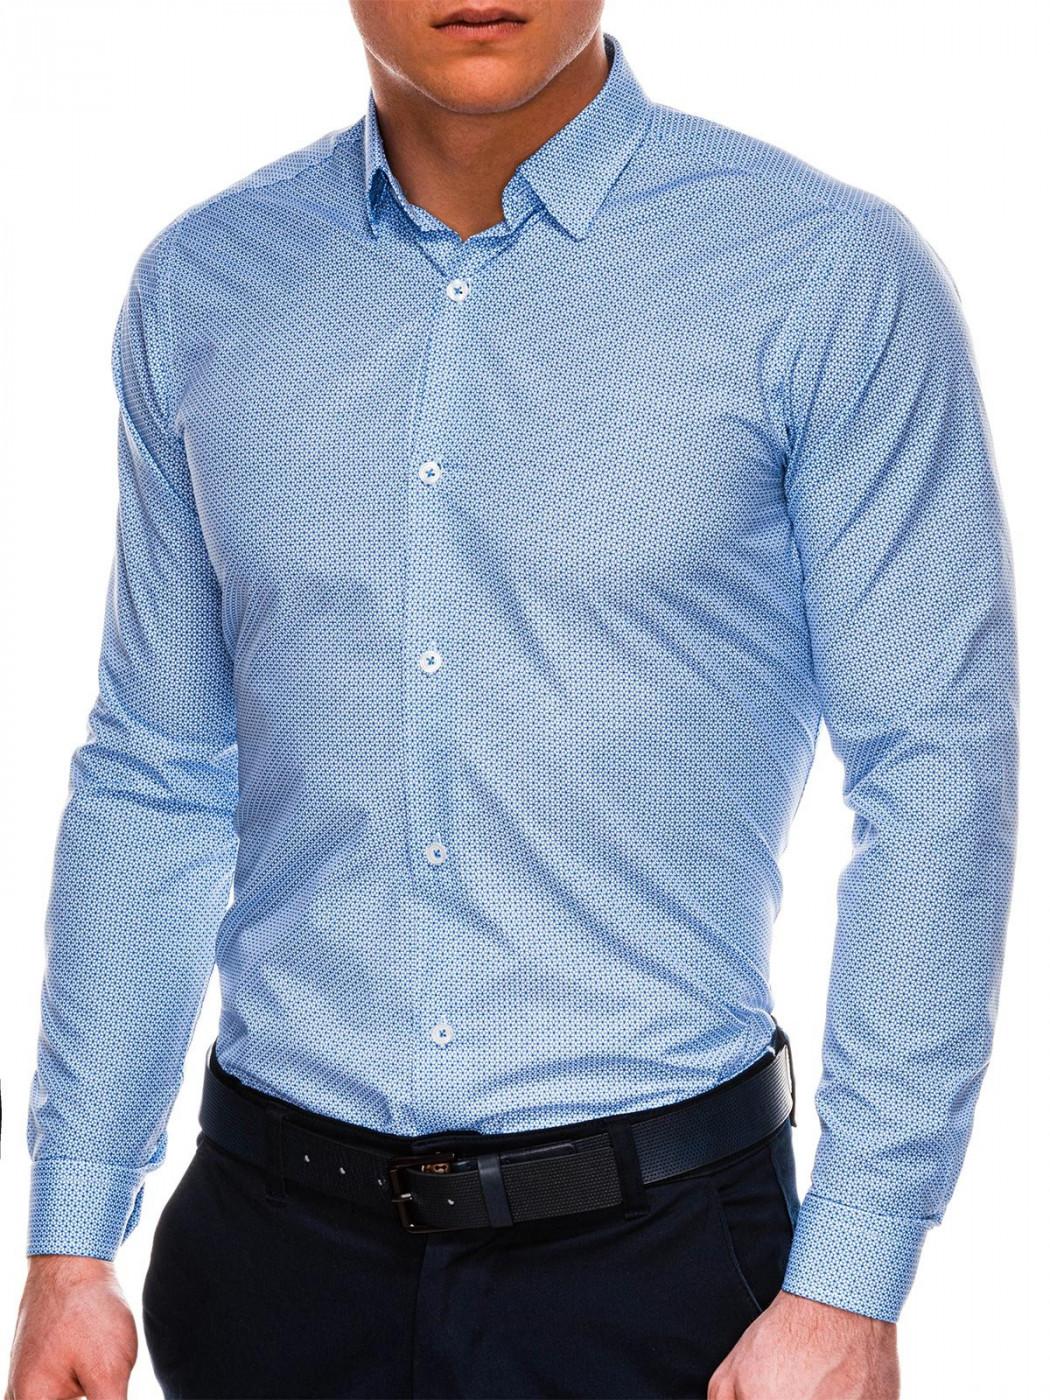 Men's Shirt Ombre K516